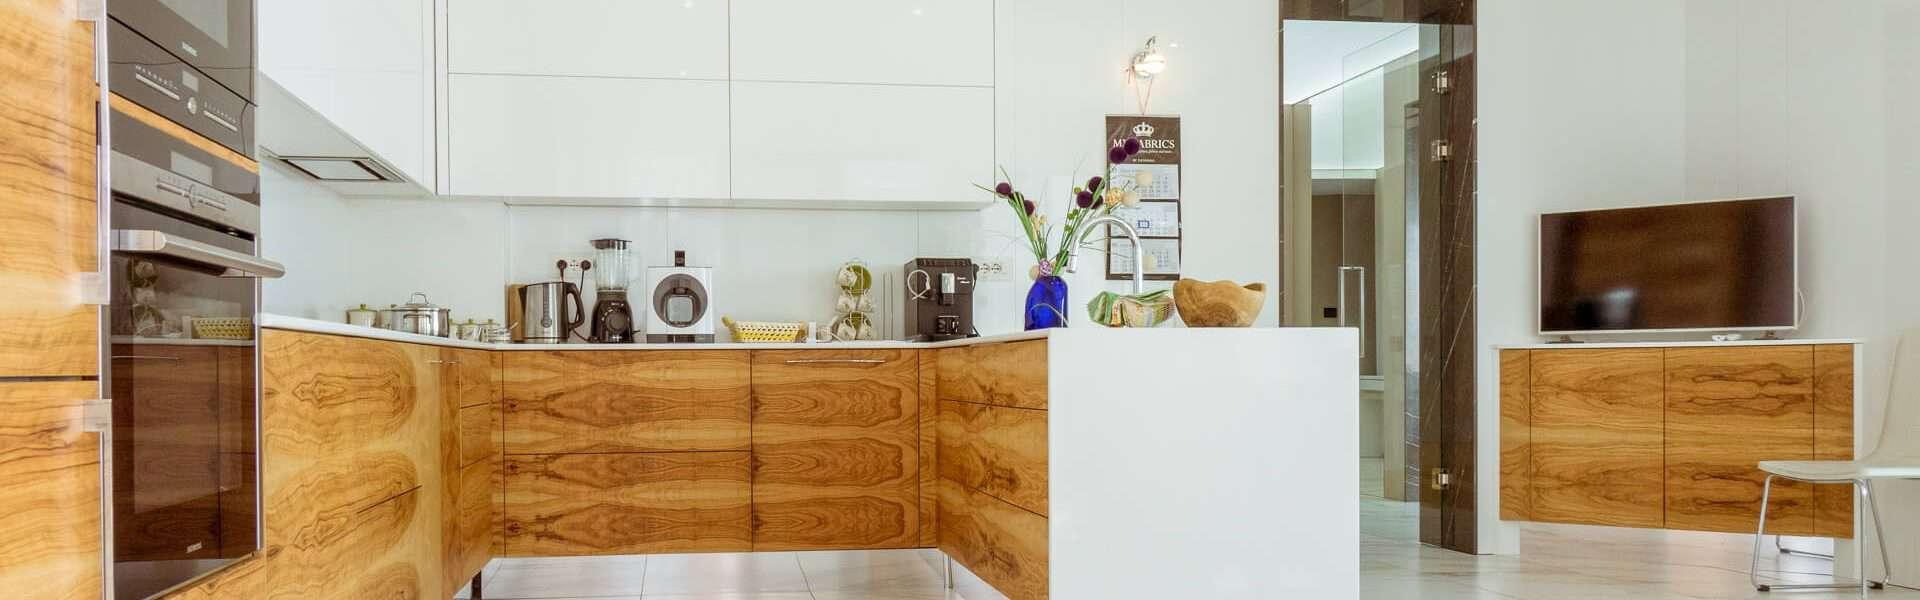 модерна кухня интериорна фотография